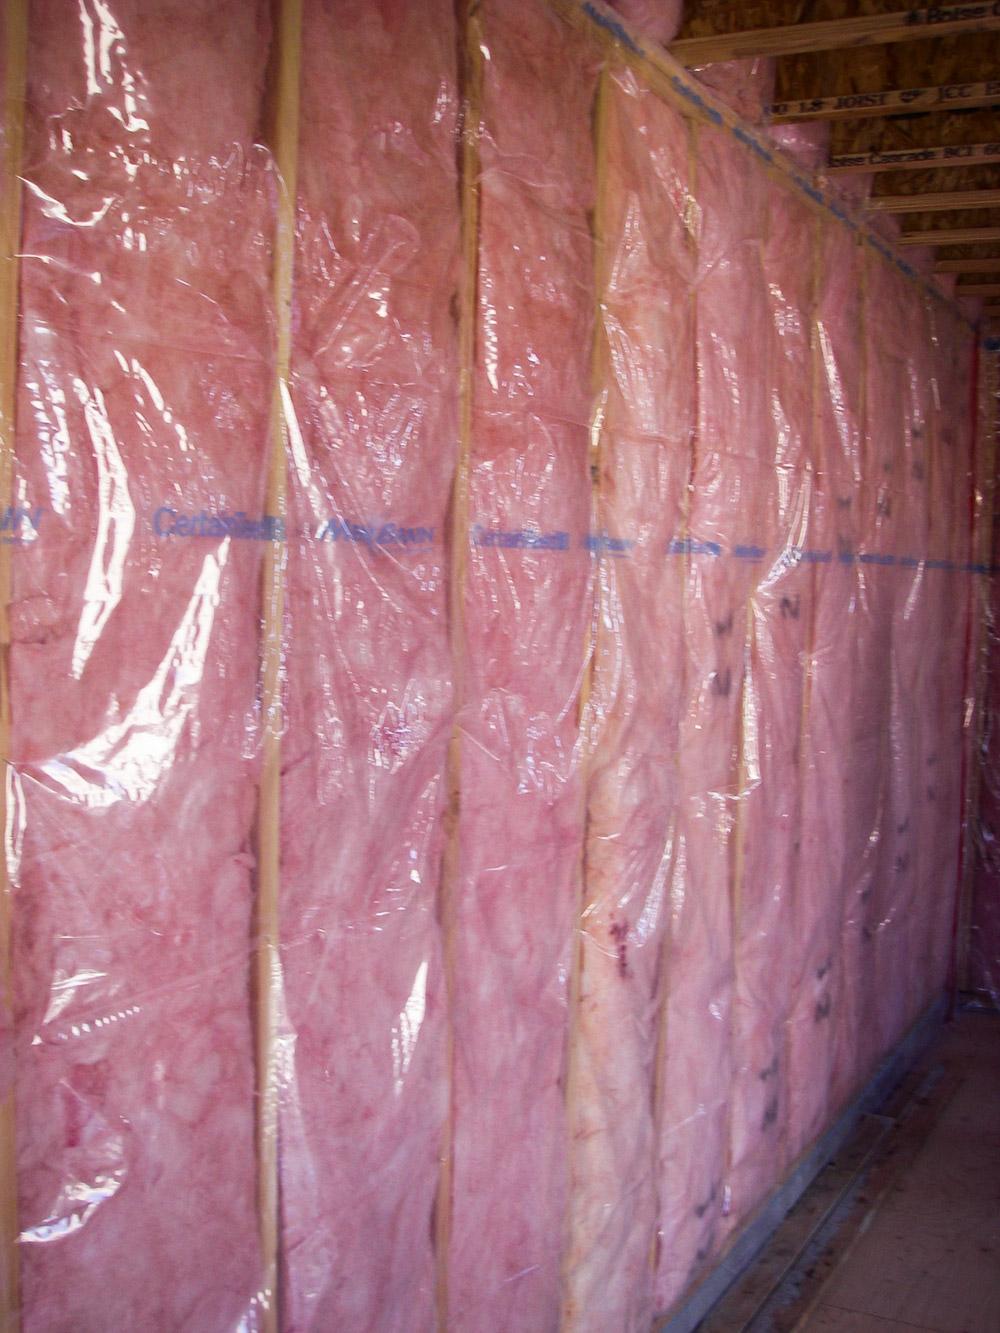 Fig. i-19 Polyamide film vapor retarder installed over a wood-framed wall with cavity batt insulation